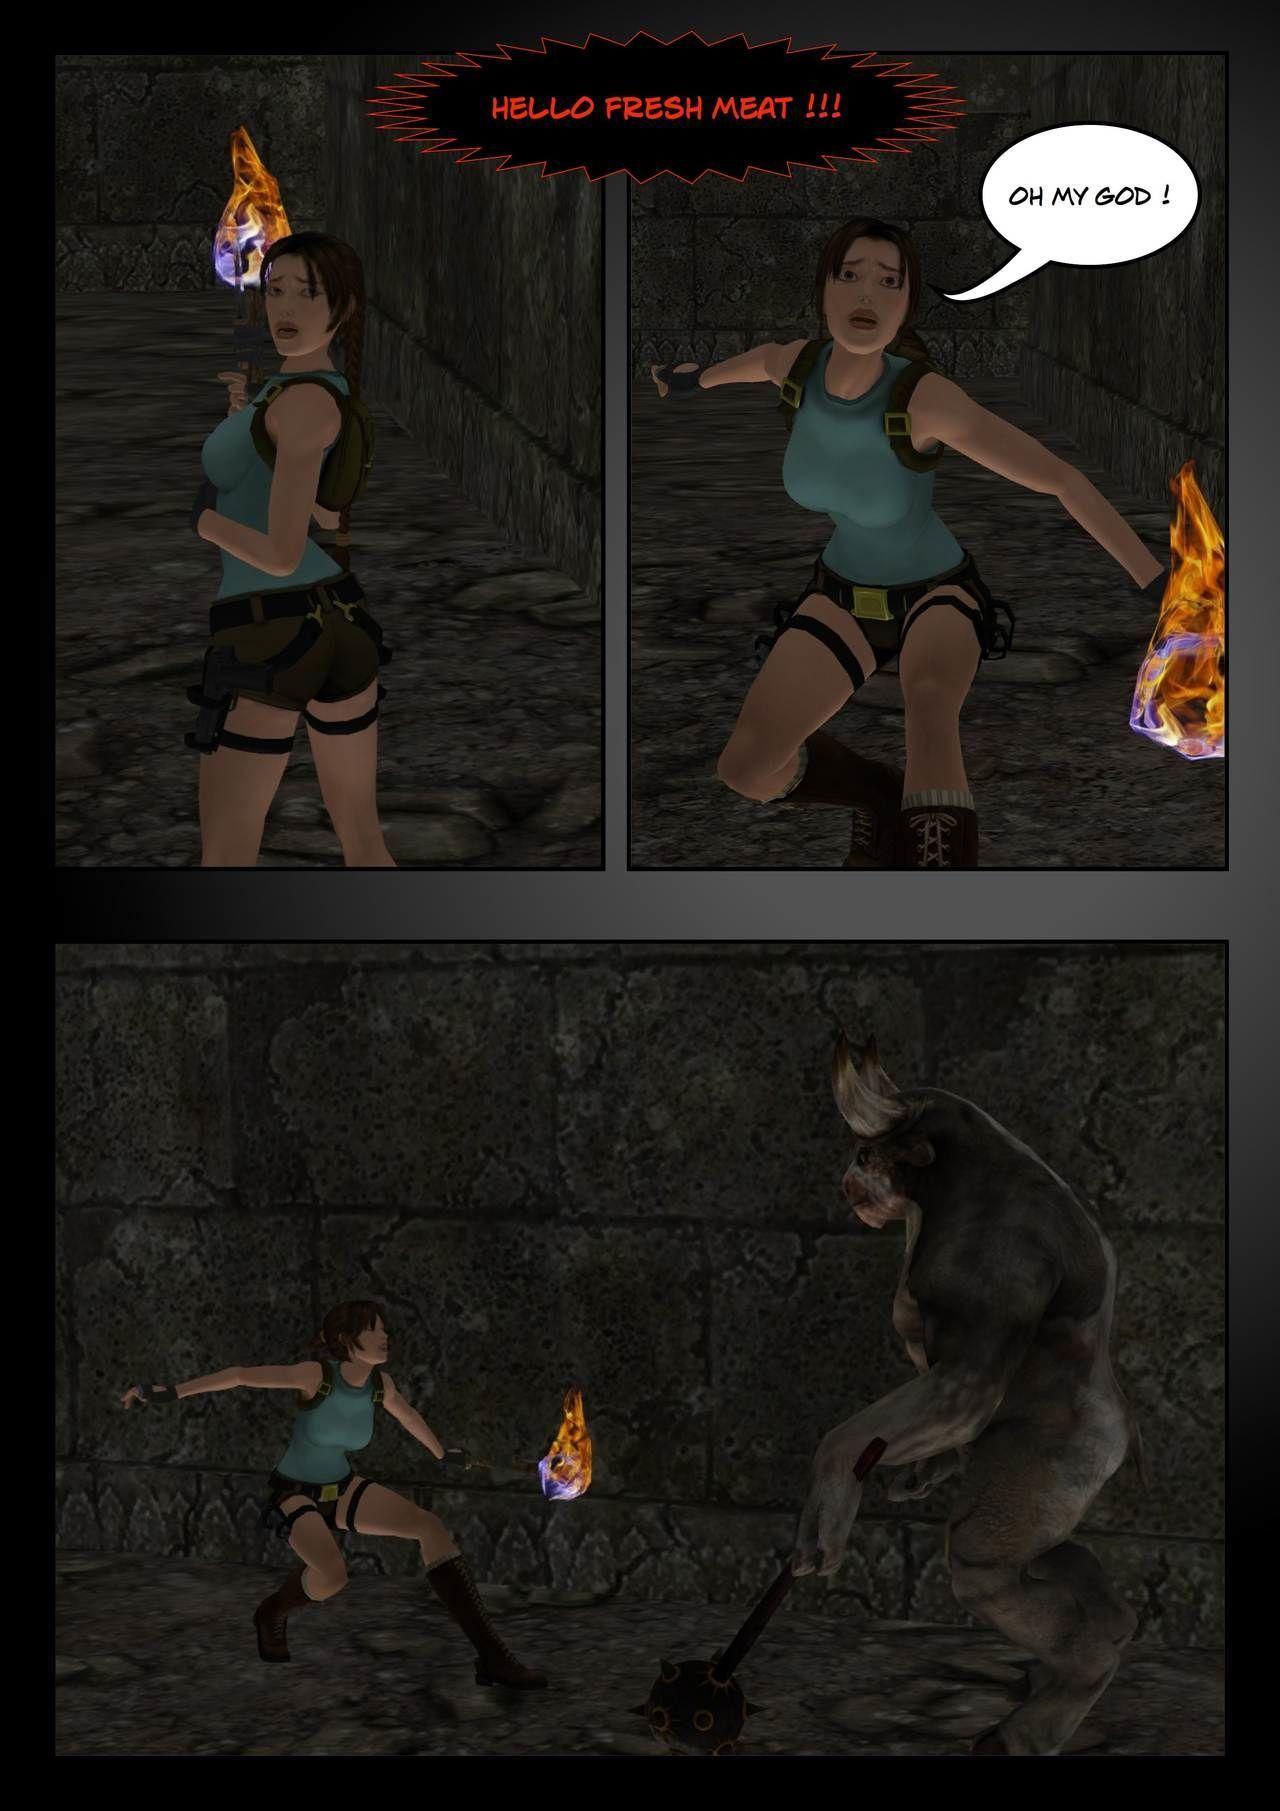 Lara Croft Vs The Minotaurus W.I.P.